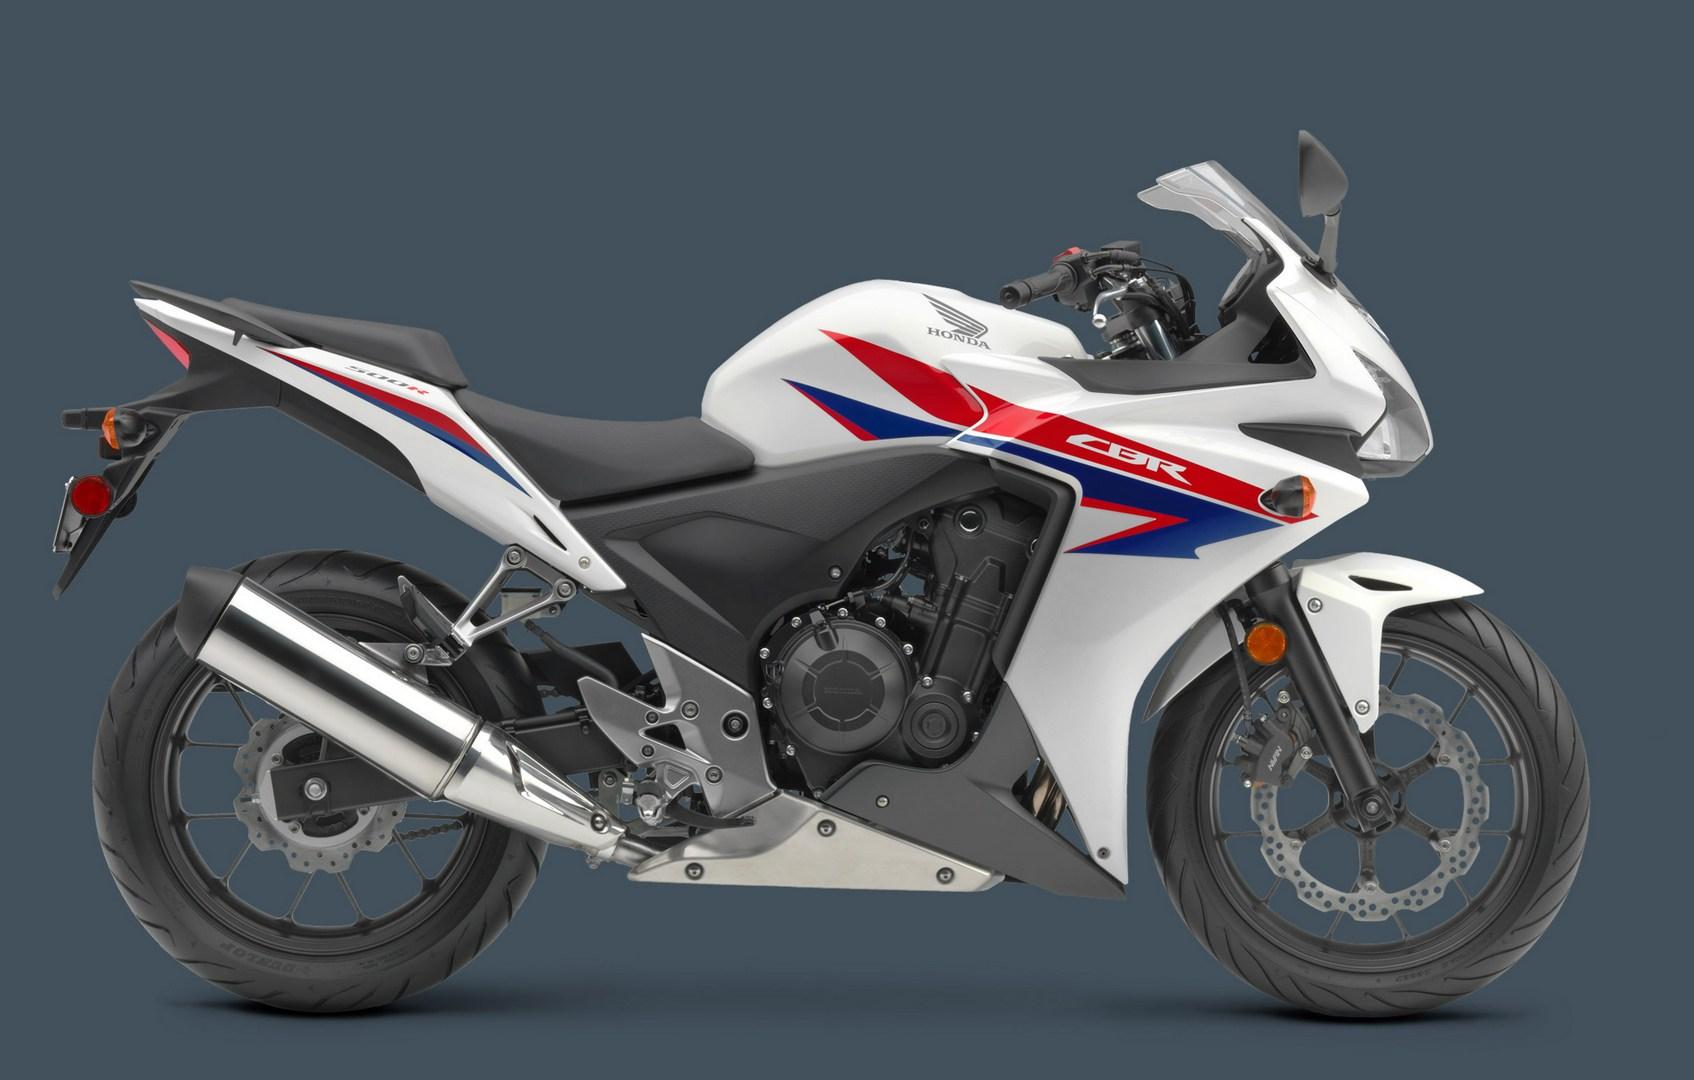 Honda Recalls 500cc Machines for Fuel Sensor Malfunction and ...